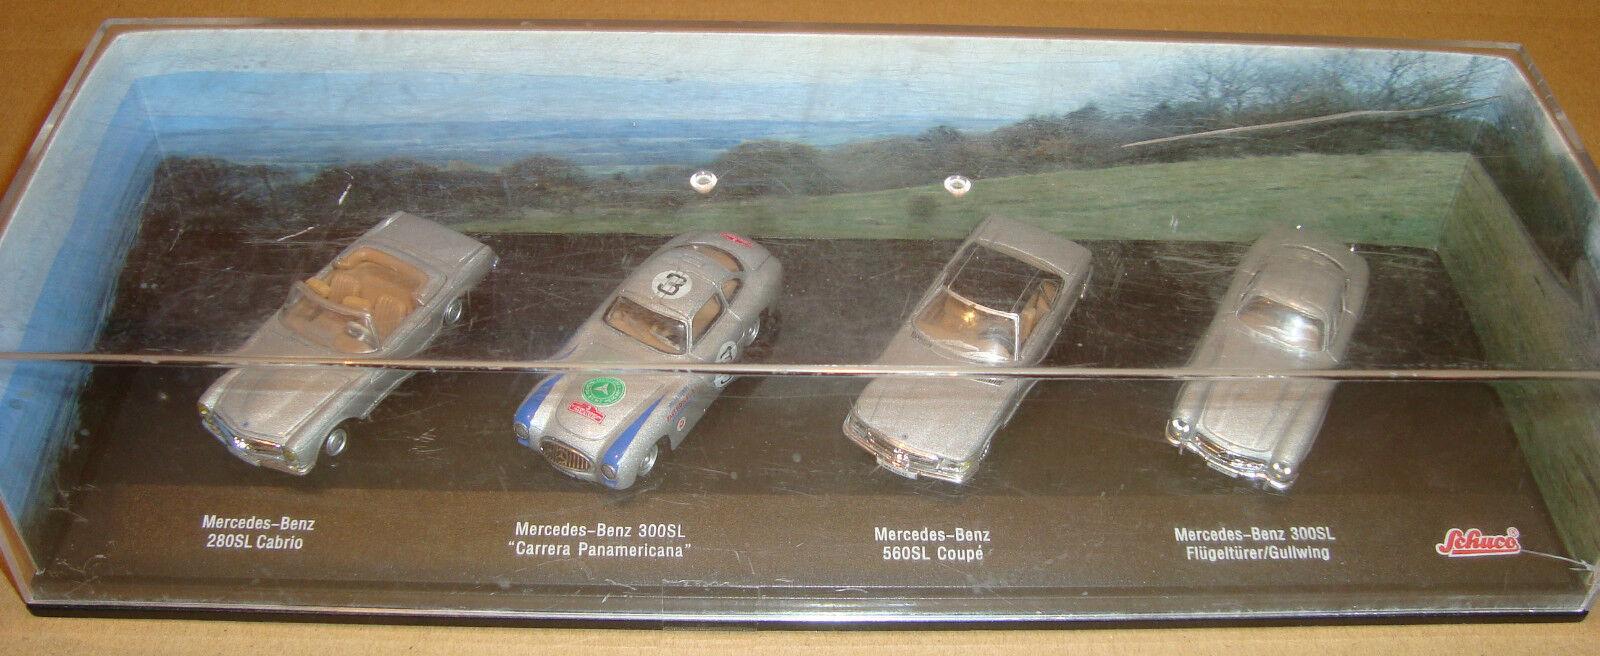 Schuco mercedes-benz 280sl cabrio   300sl carrera   560sl coup    300sl flugelturer